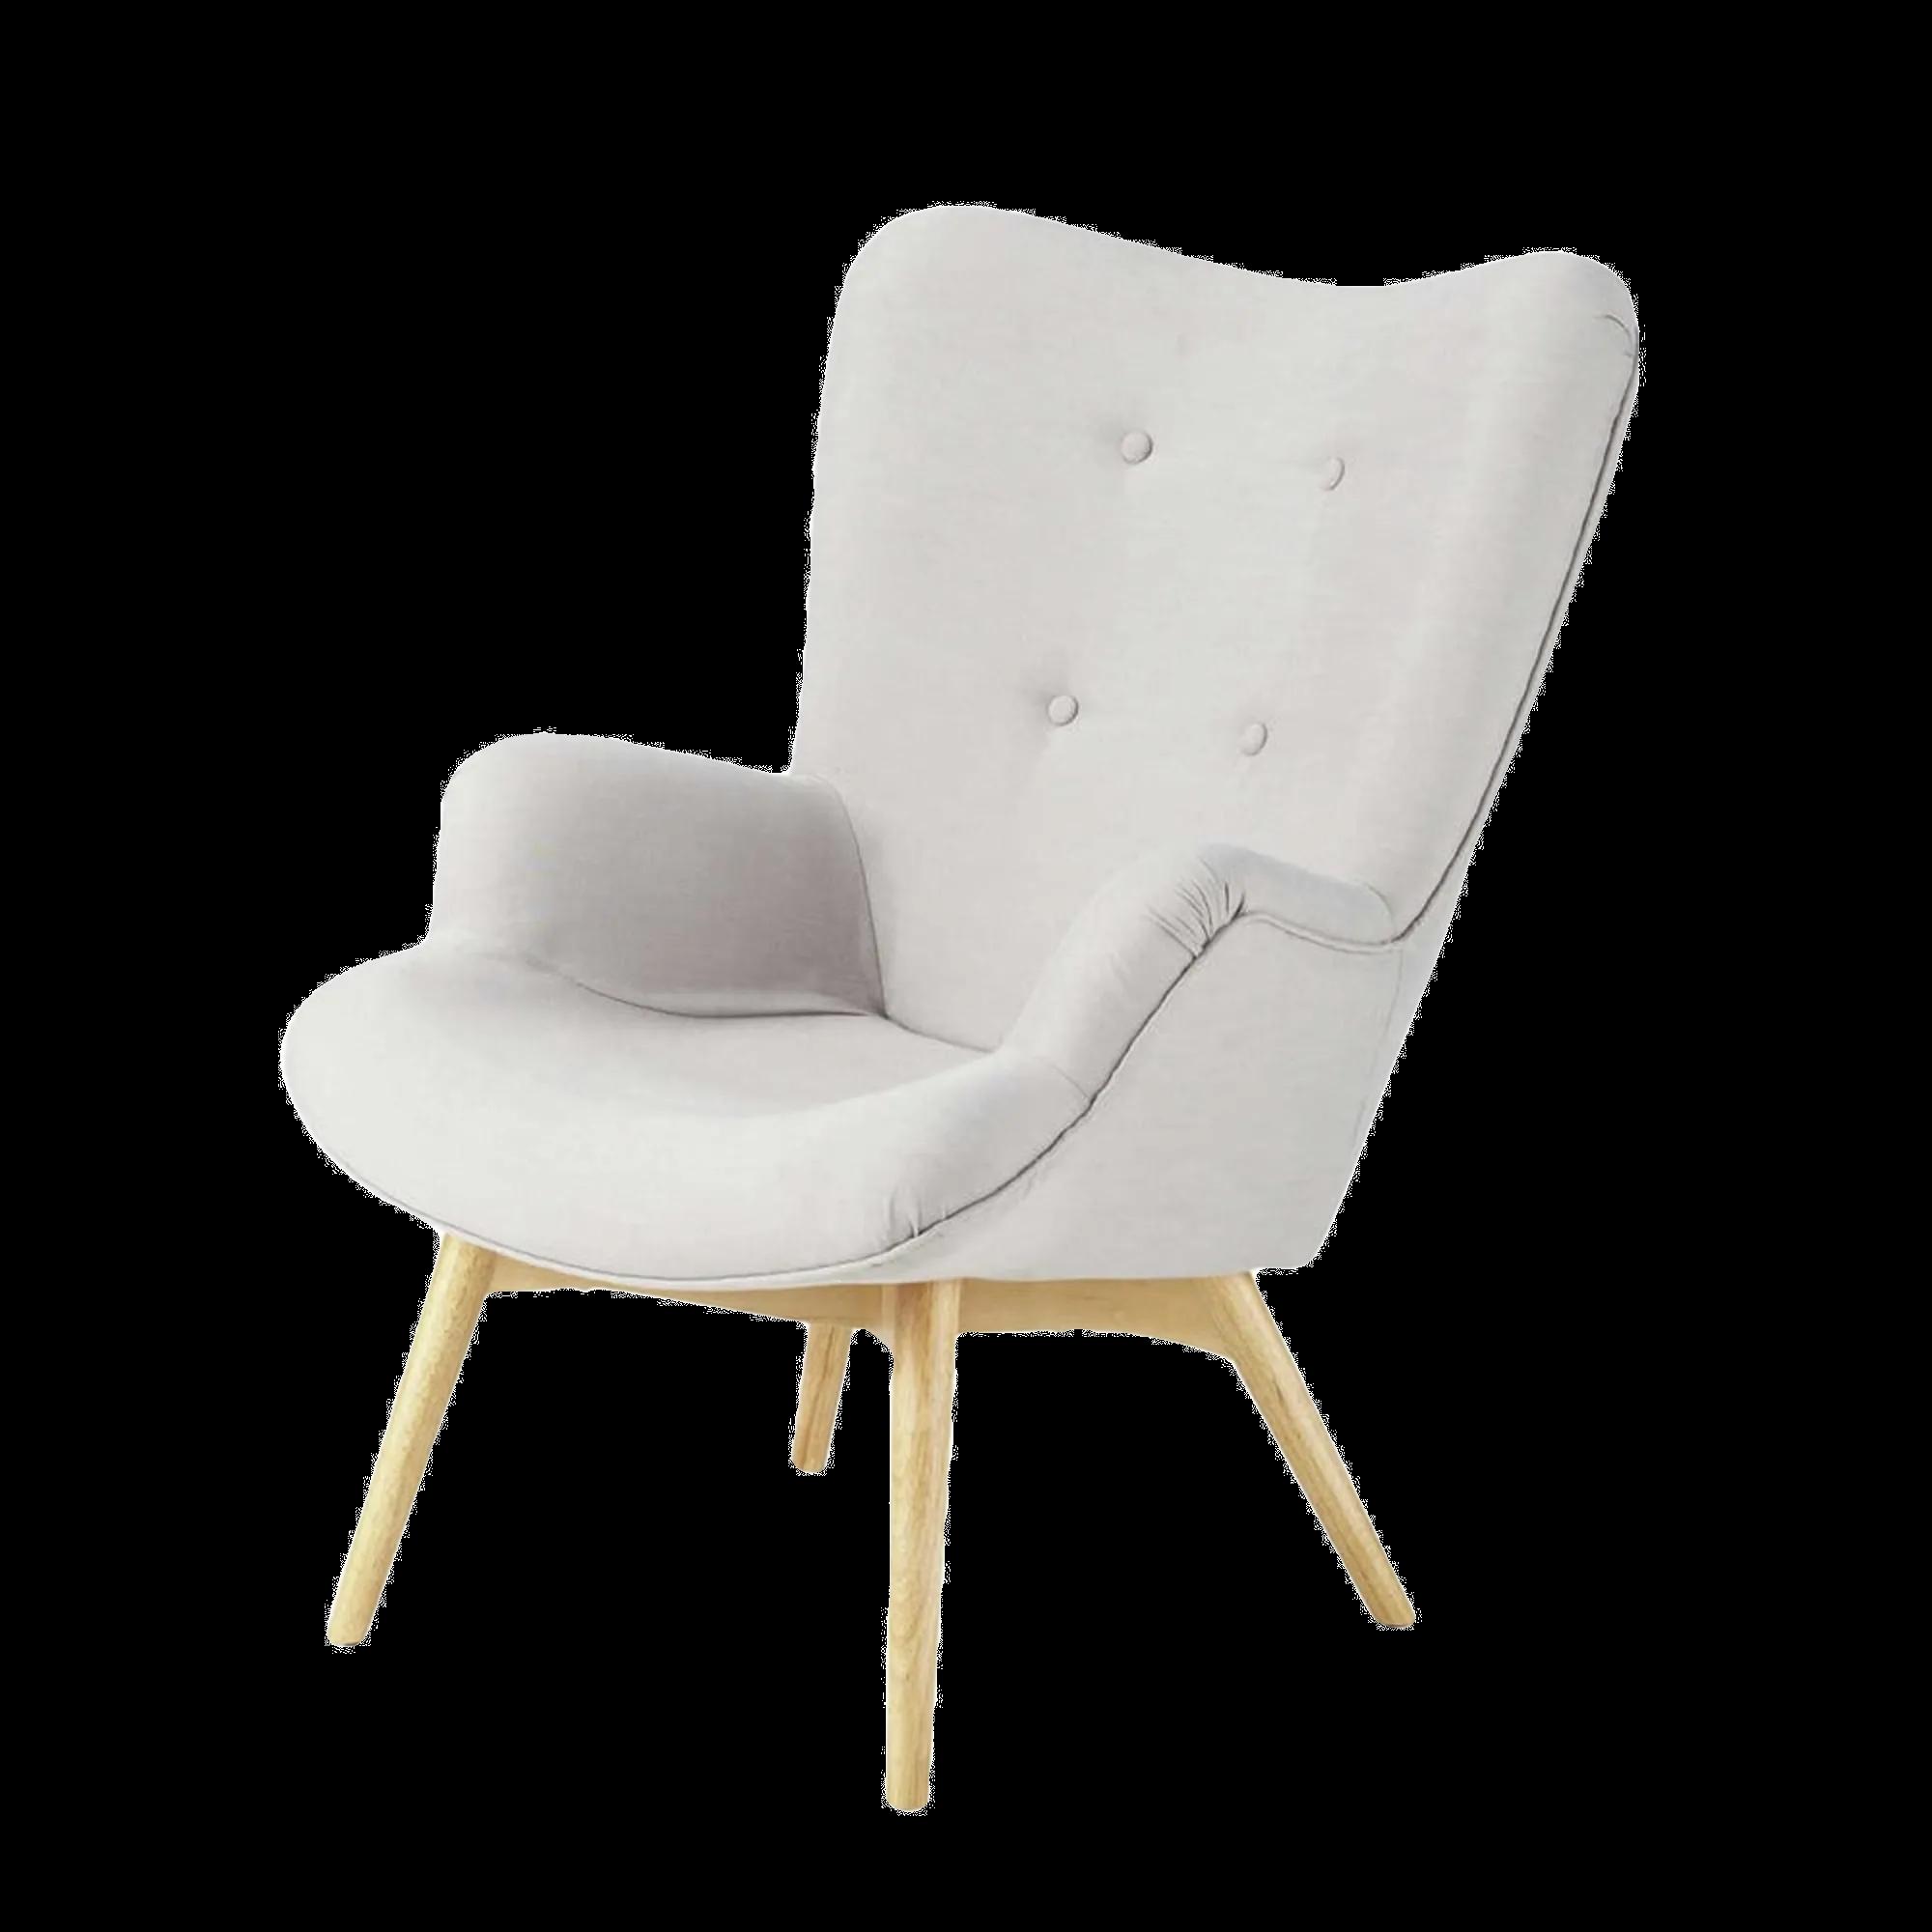 fauteuil-style-scandinave-gris-clair-100